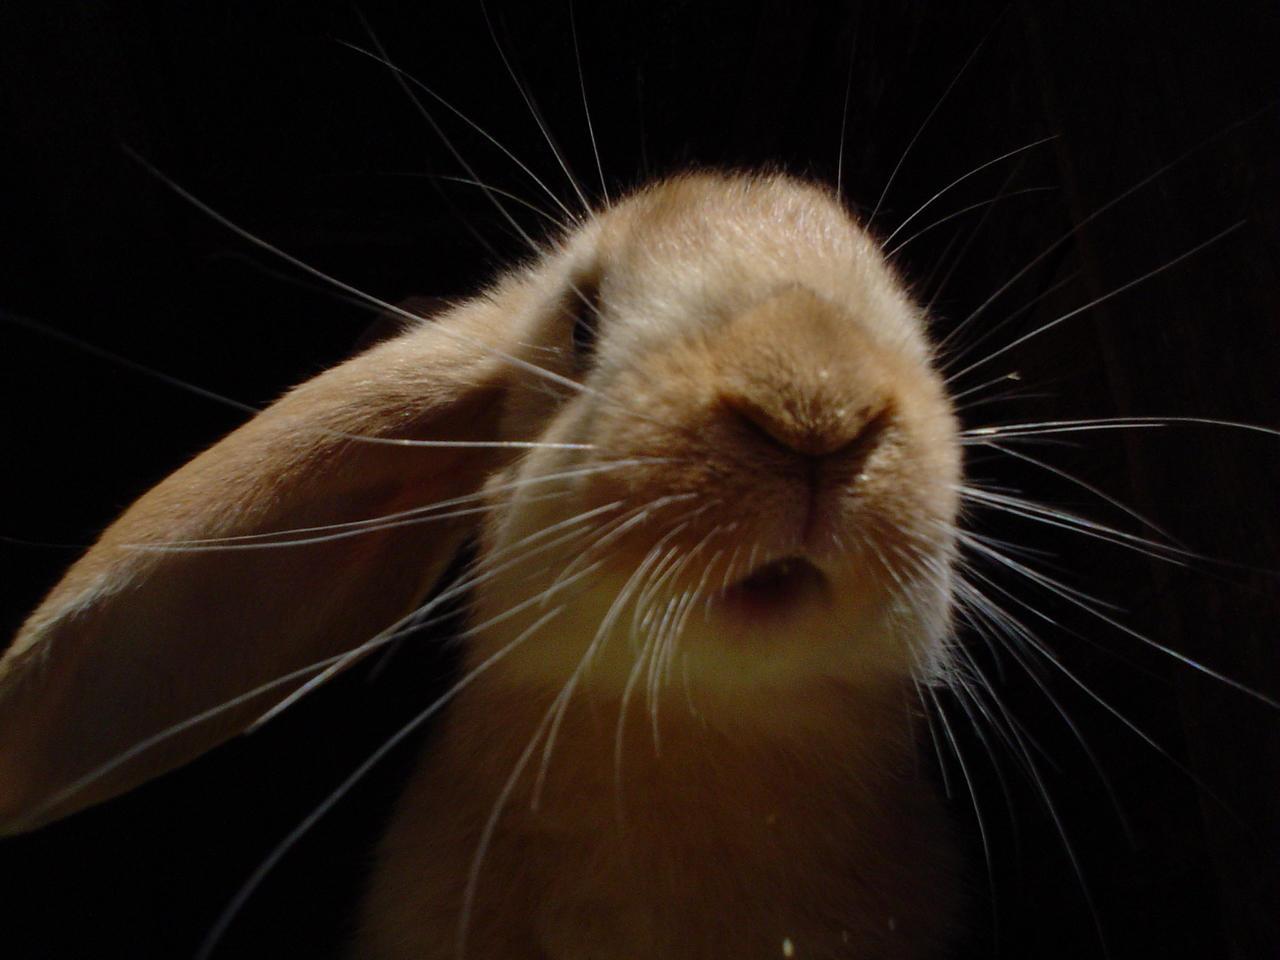 Rabbit by Vajk